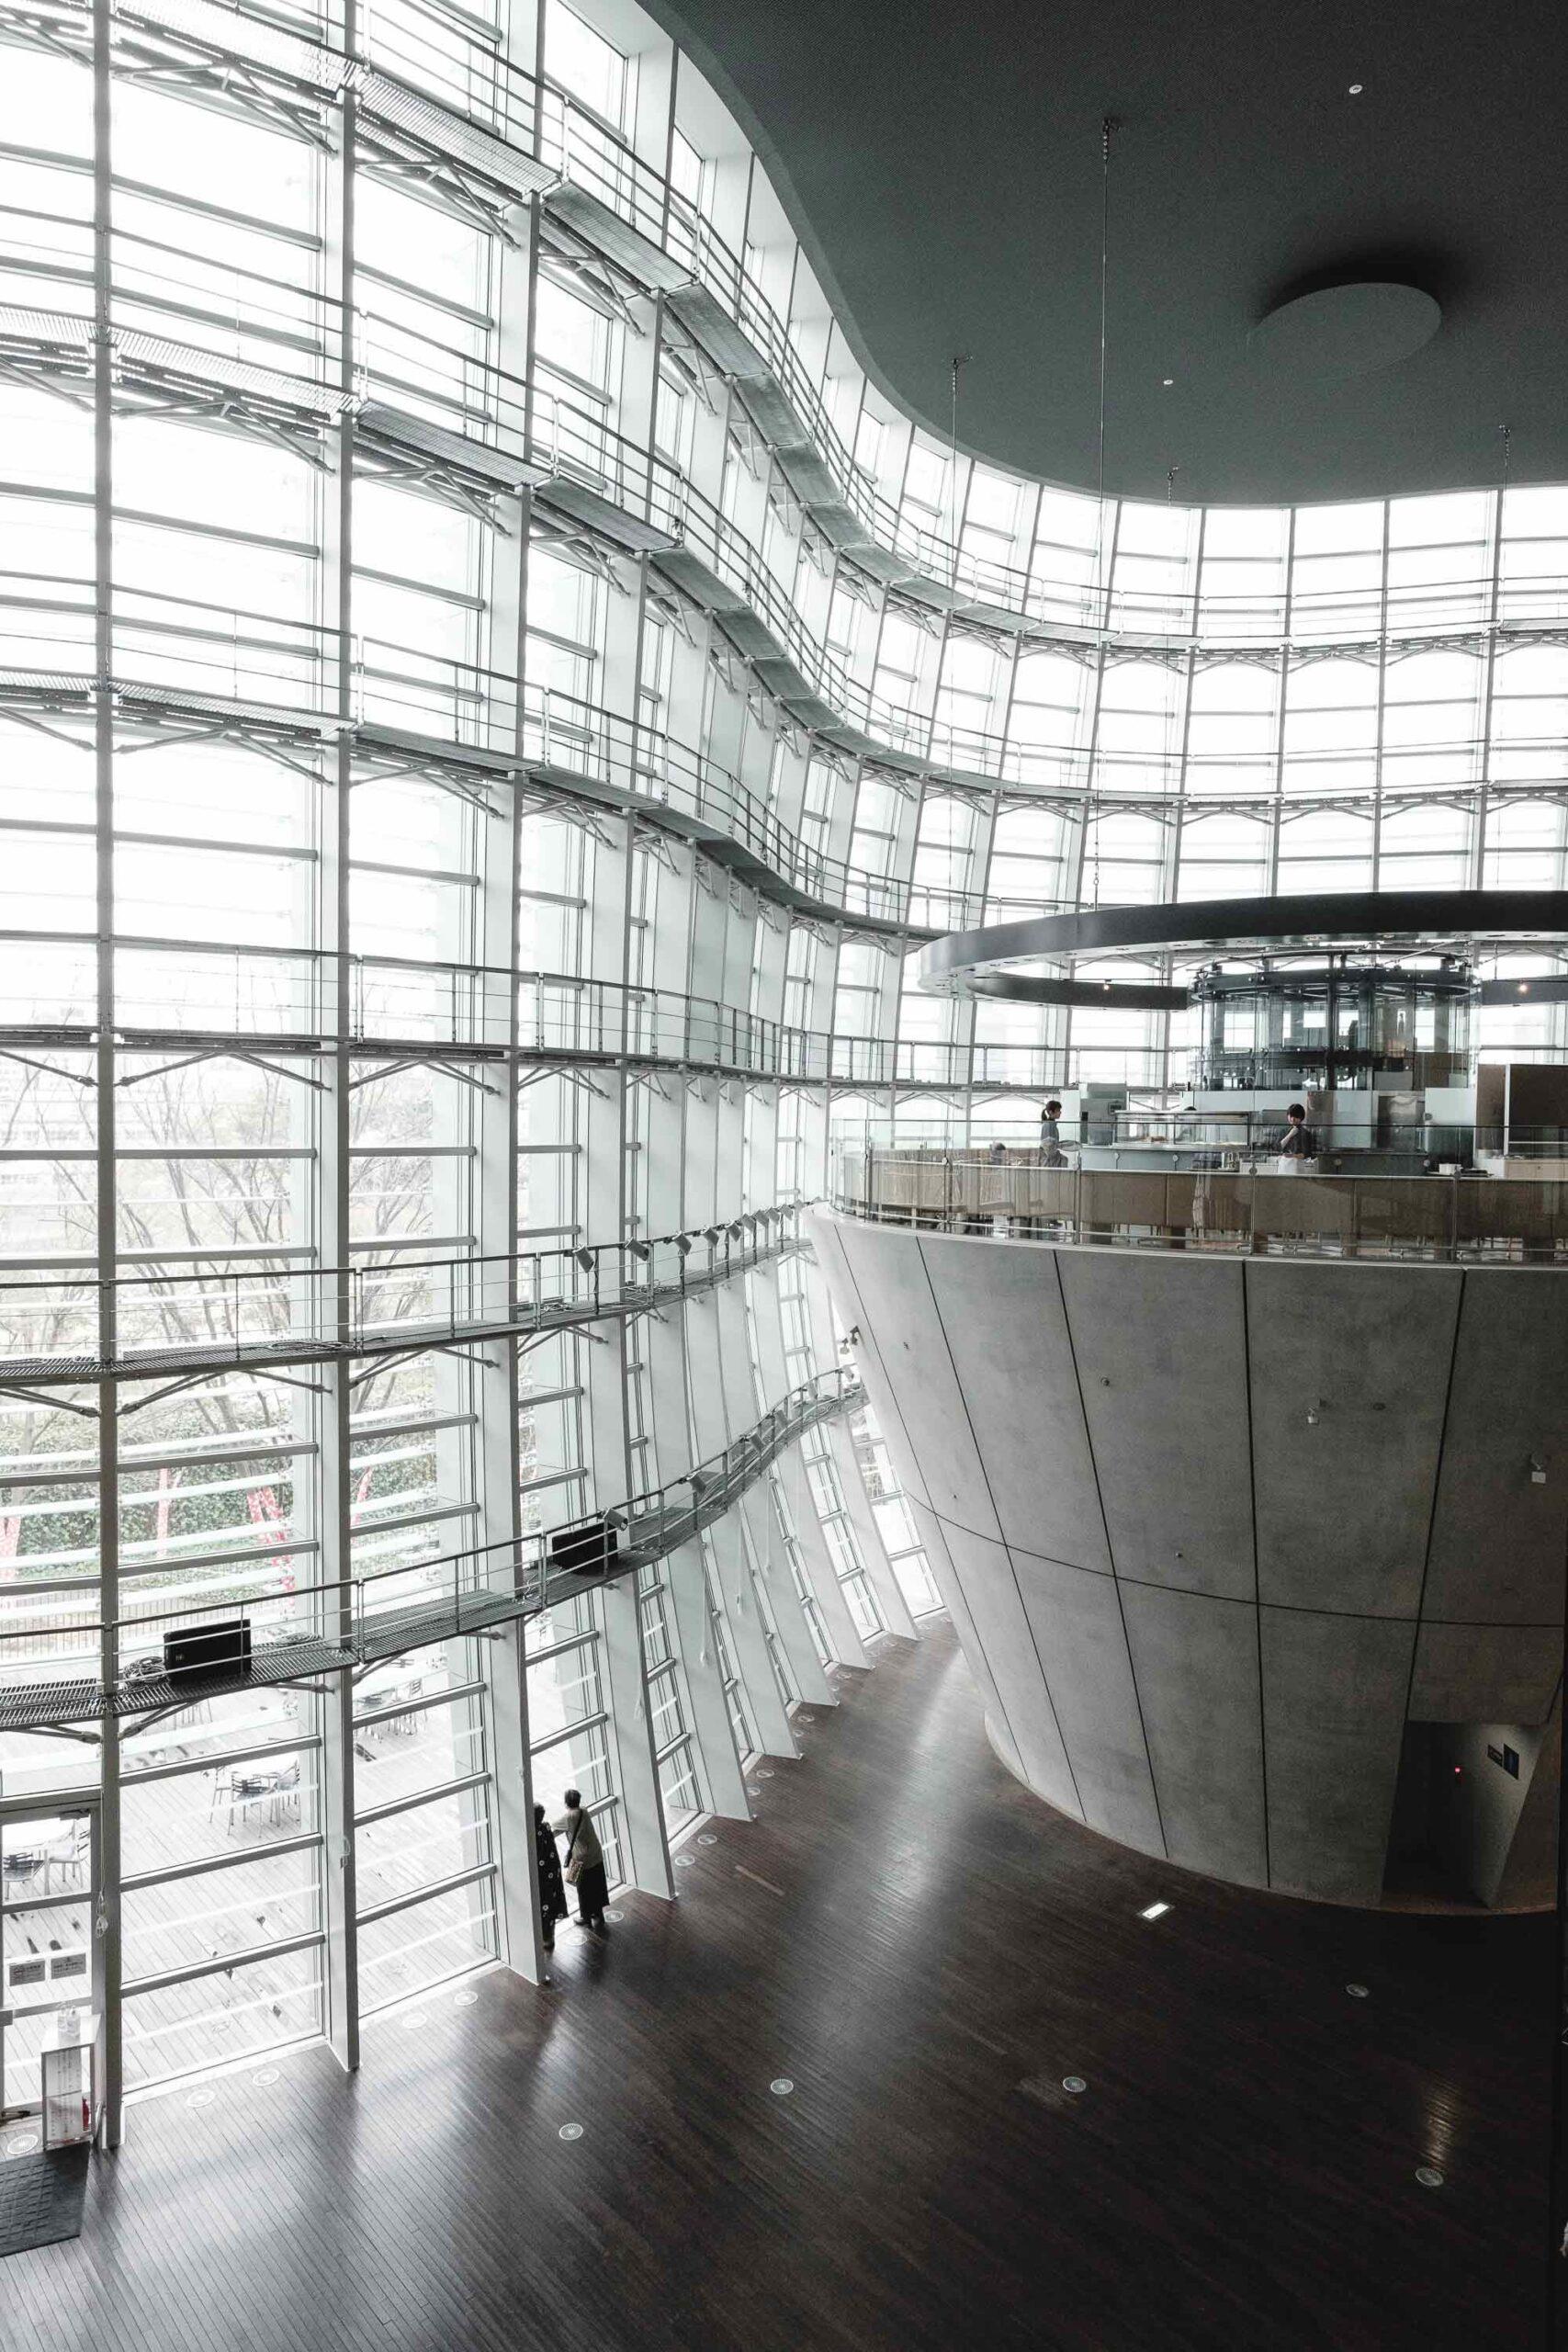 Minato-ku, The National Art Center, Tokyo, Minato-ku, Japan